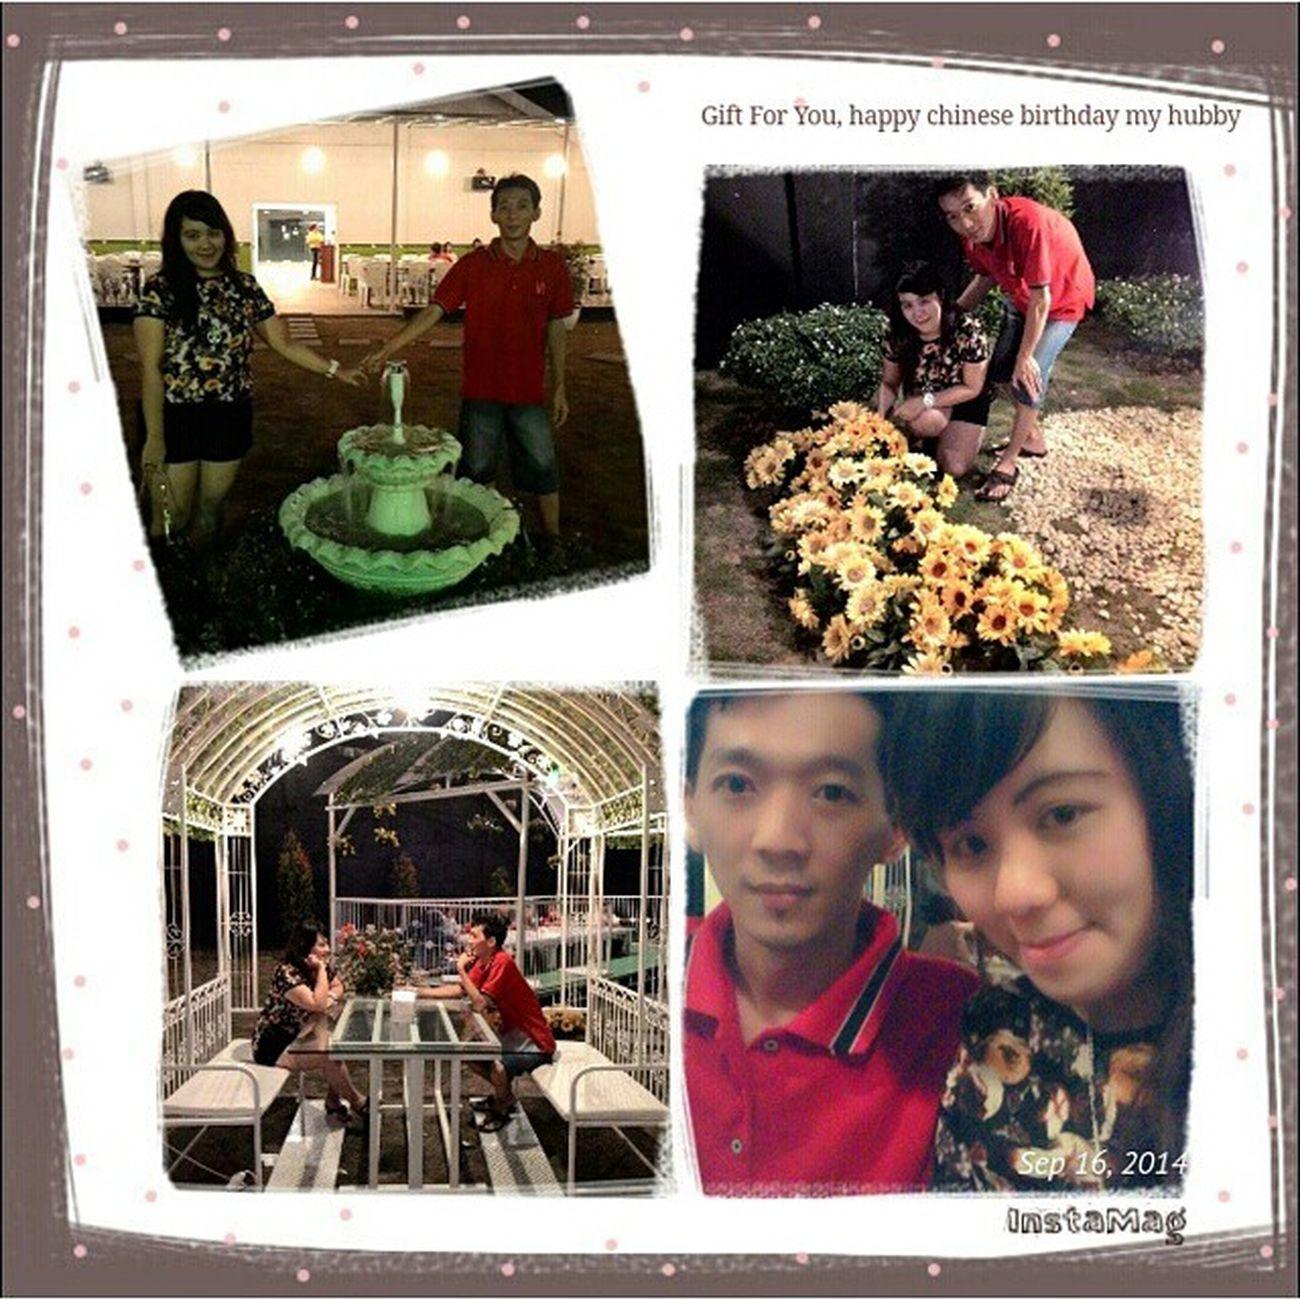 Hcbd Chinesebday Latepost Ducktale qualitytime lovemoment younglic_alfgil narsis InstaMagAndroid